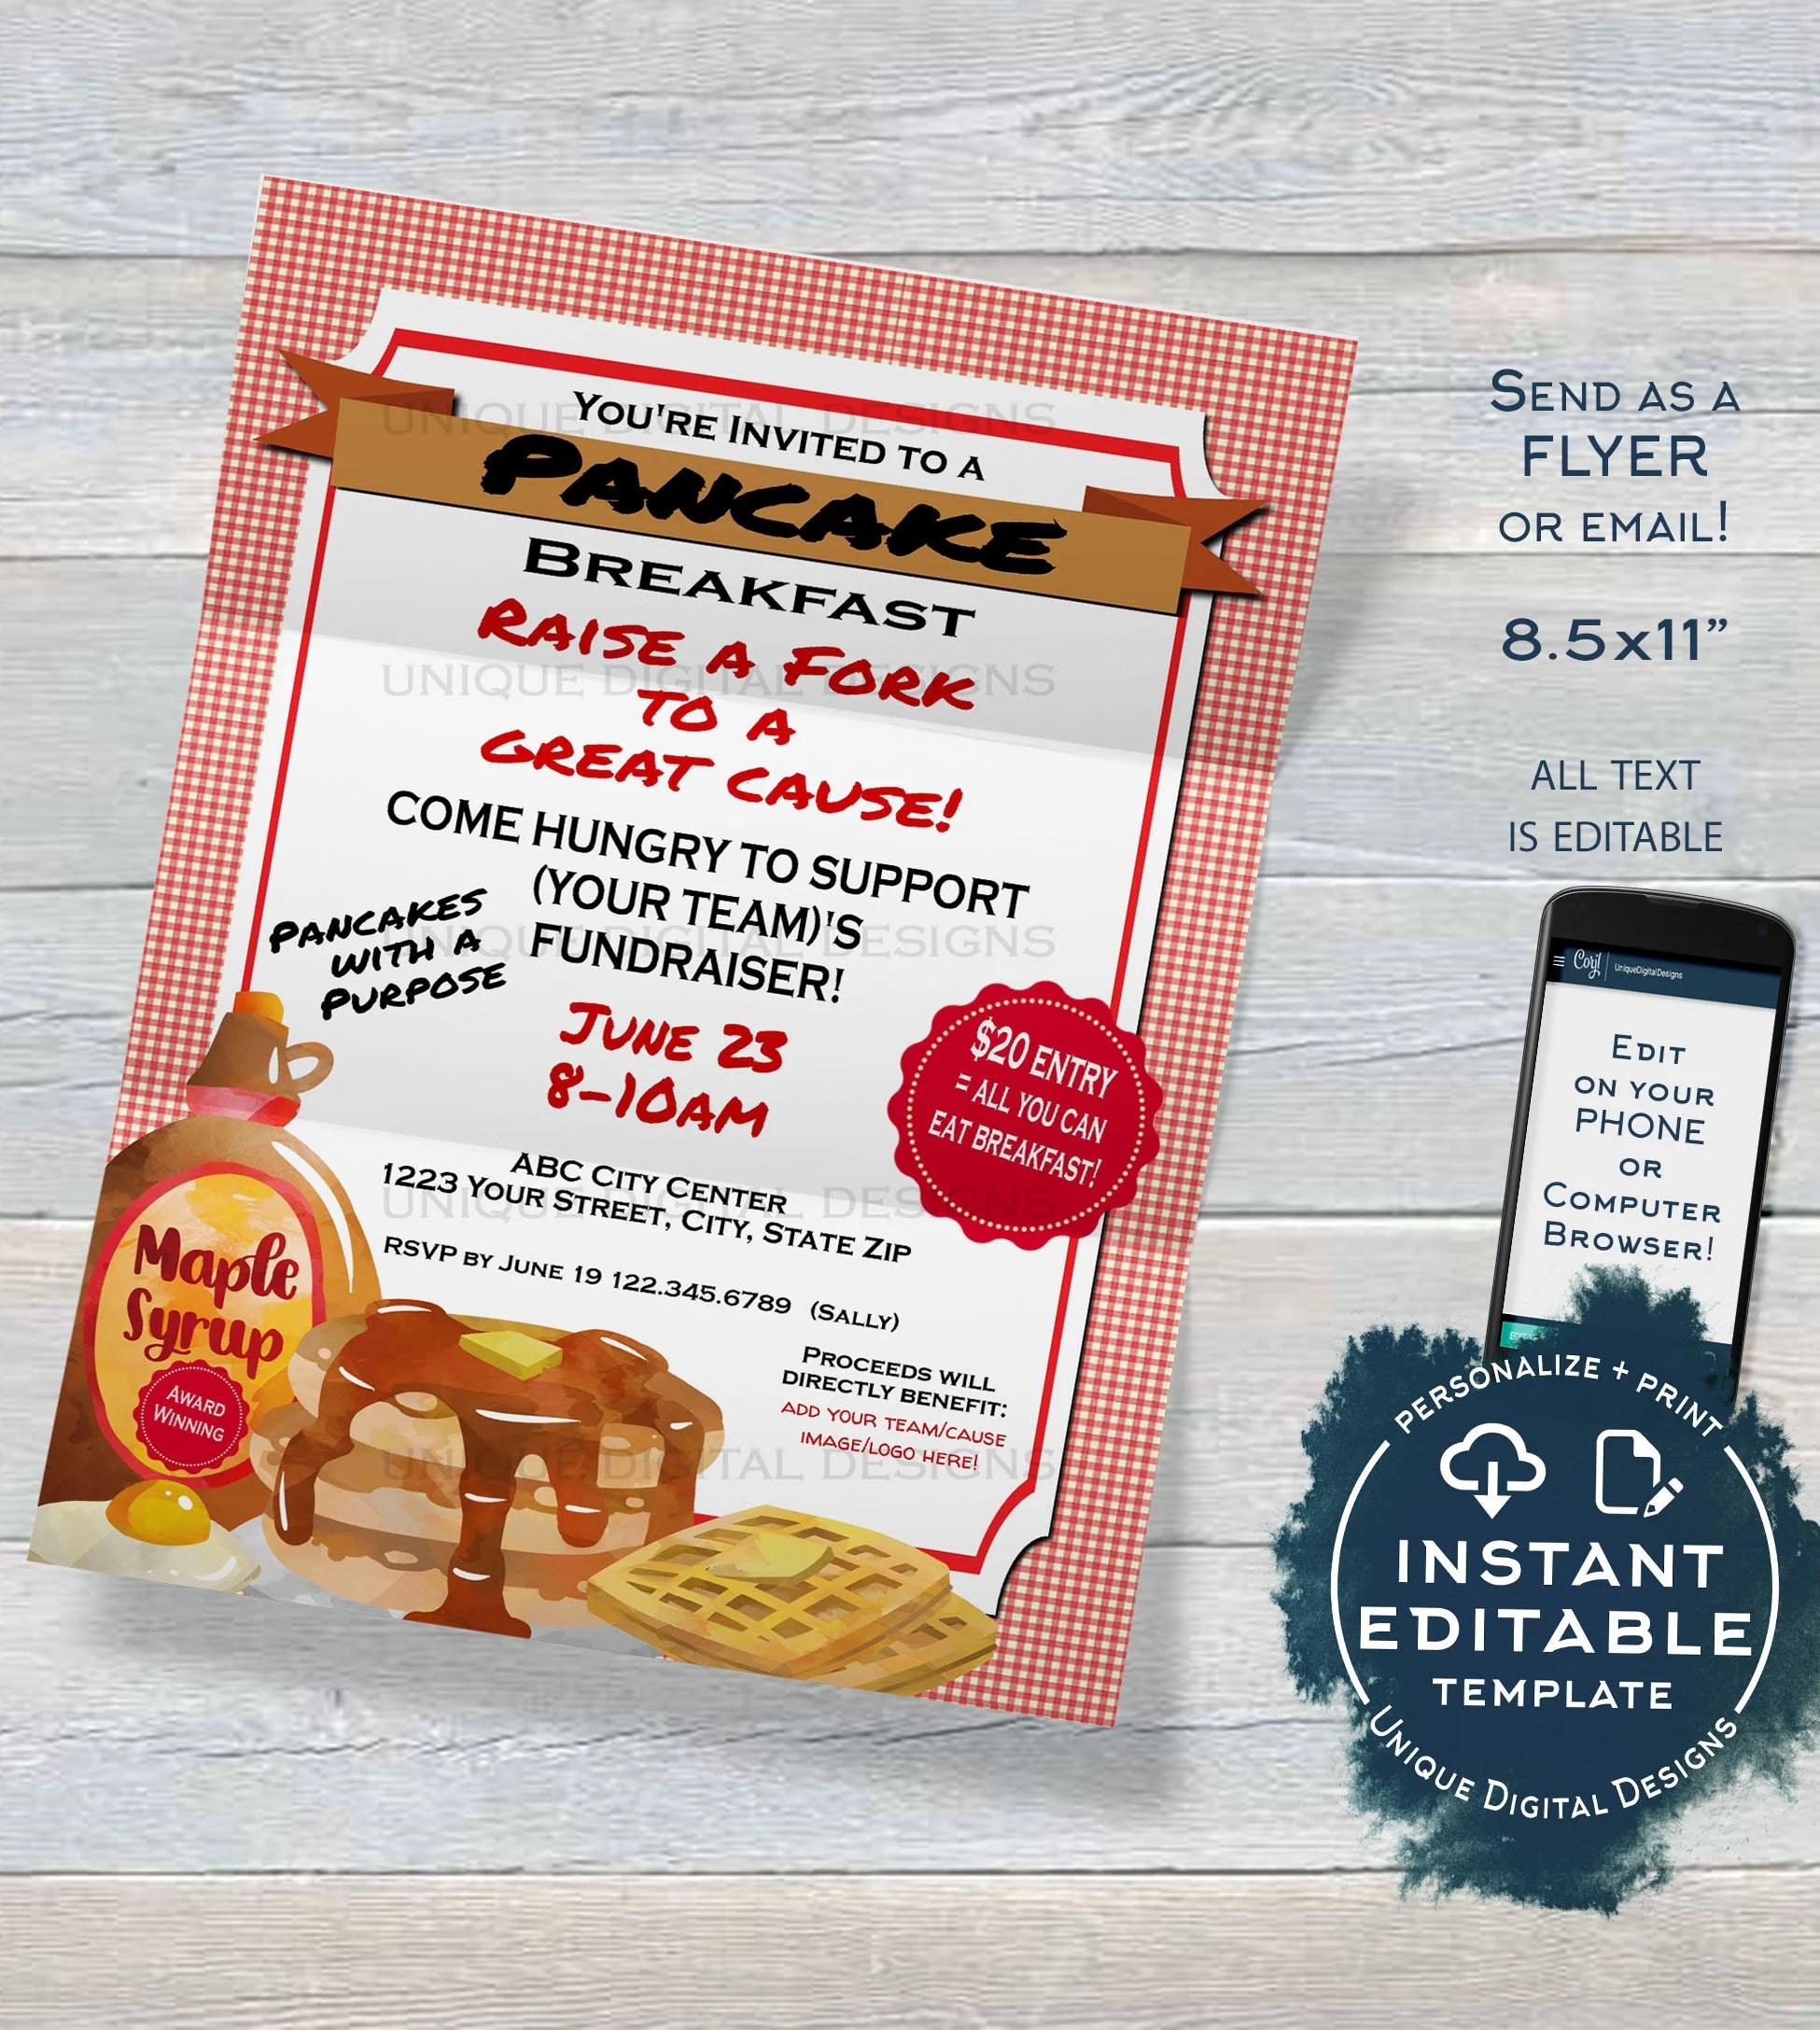 Pancake Breakfast Fundraiser FLYER Invitation Editable Etsy